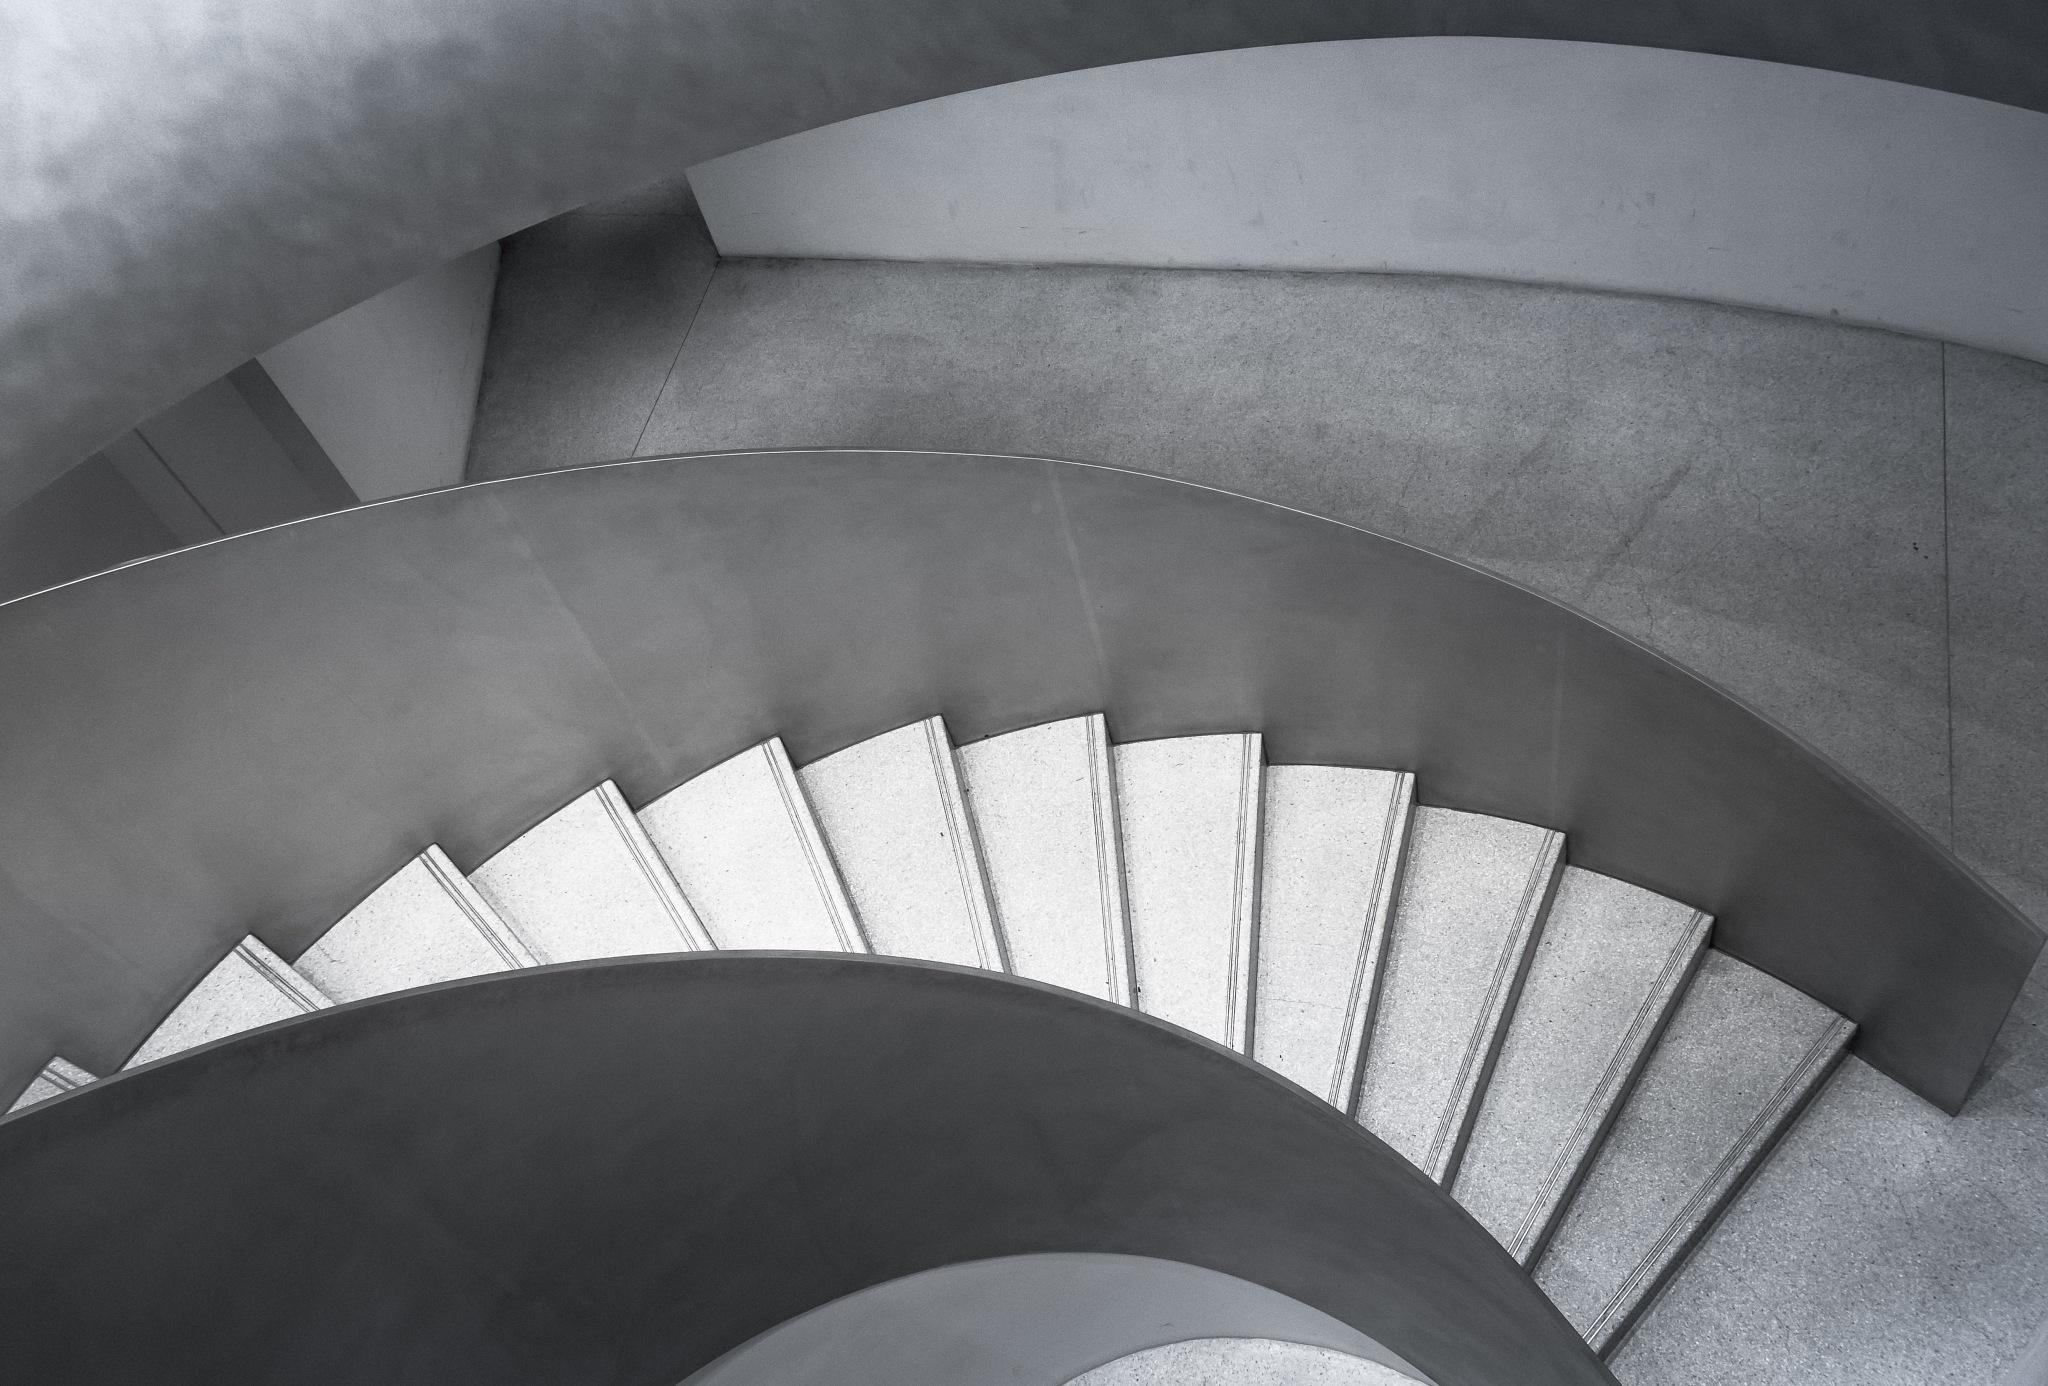 Wave-stairs by Hervé Samson